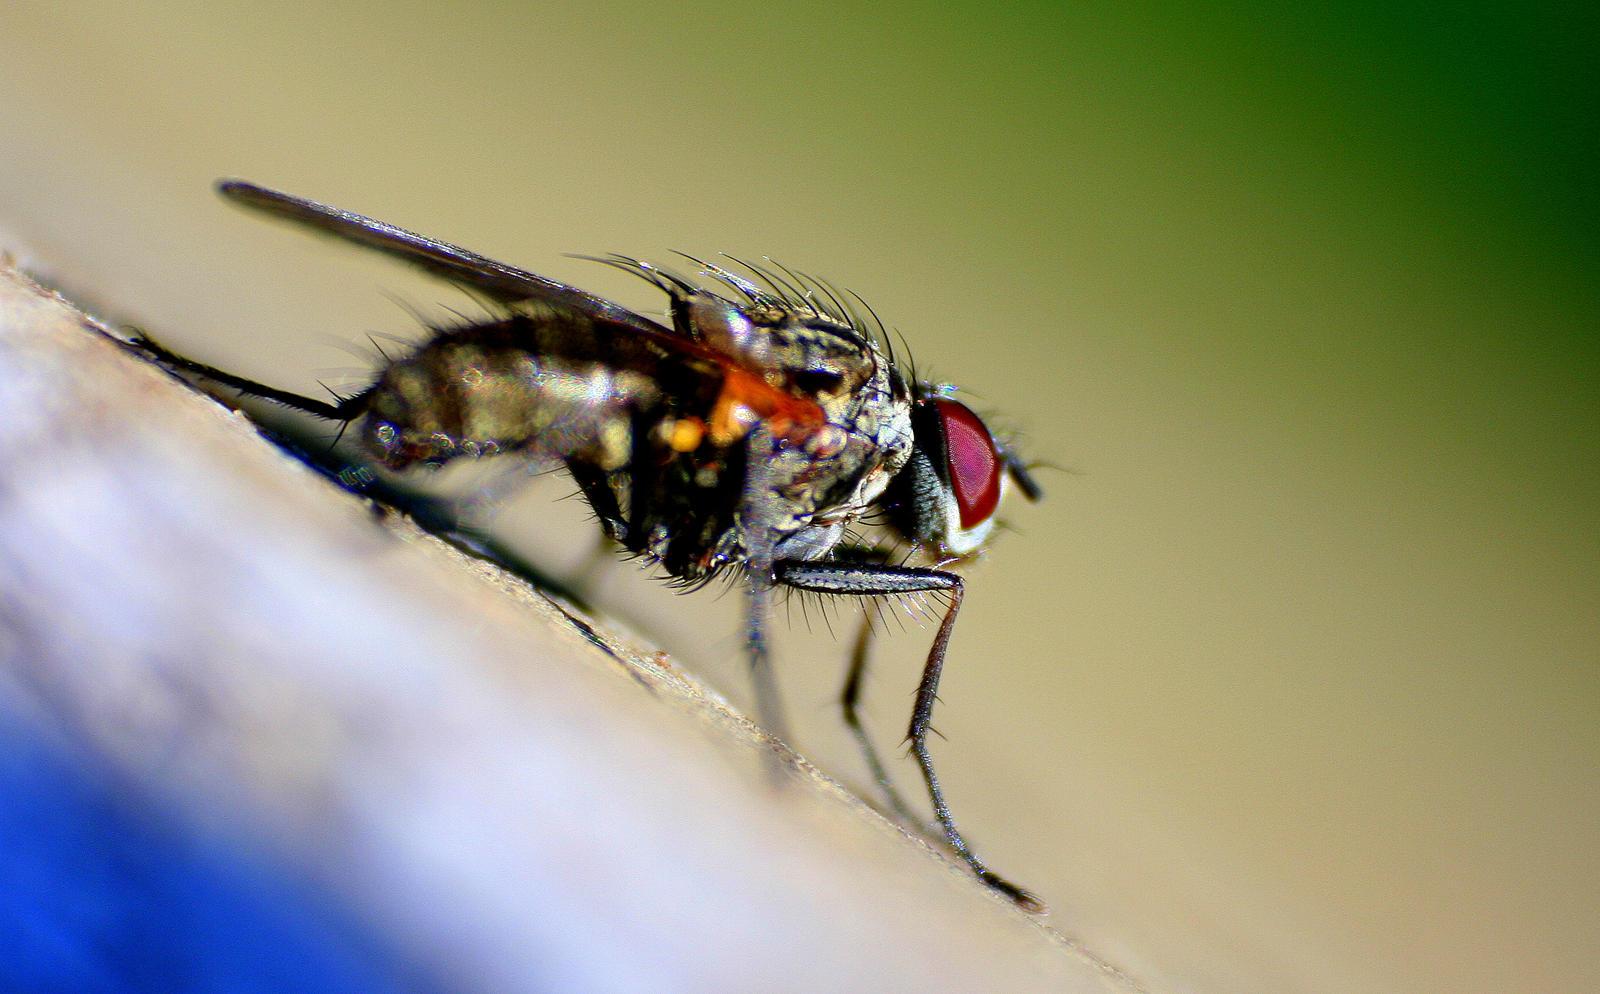 Fly by entropy462